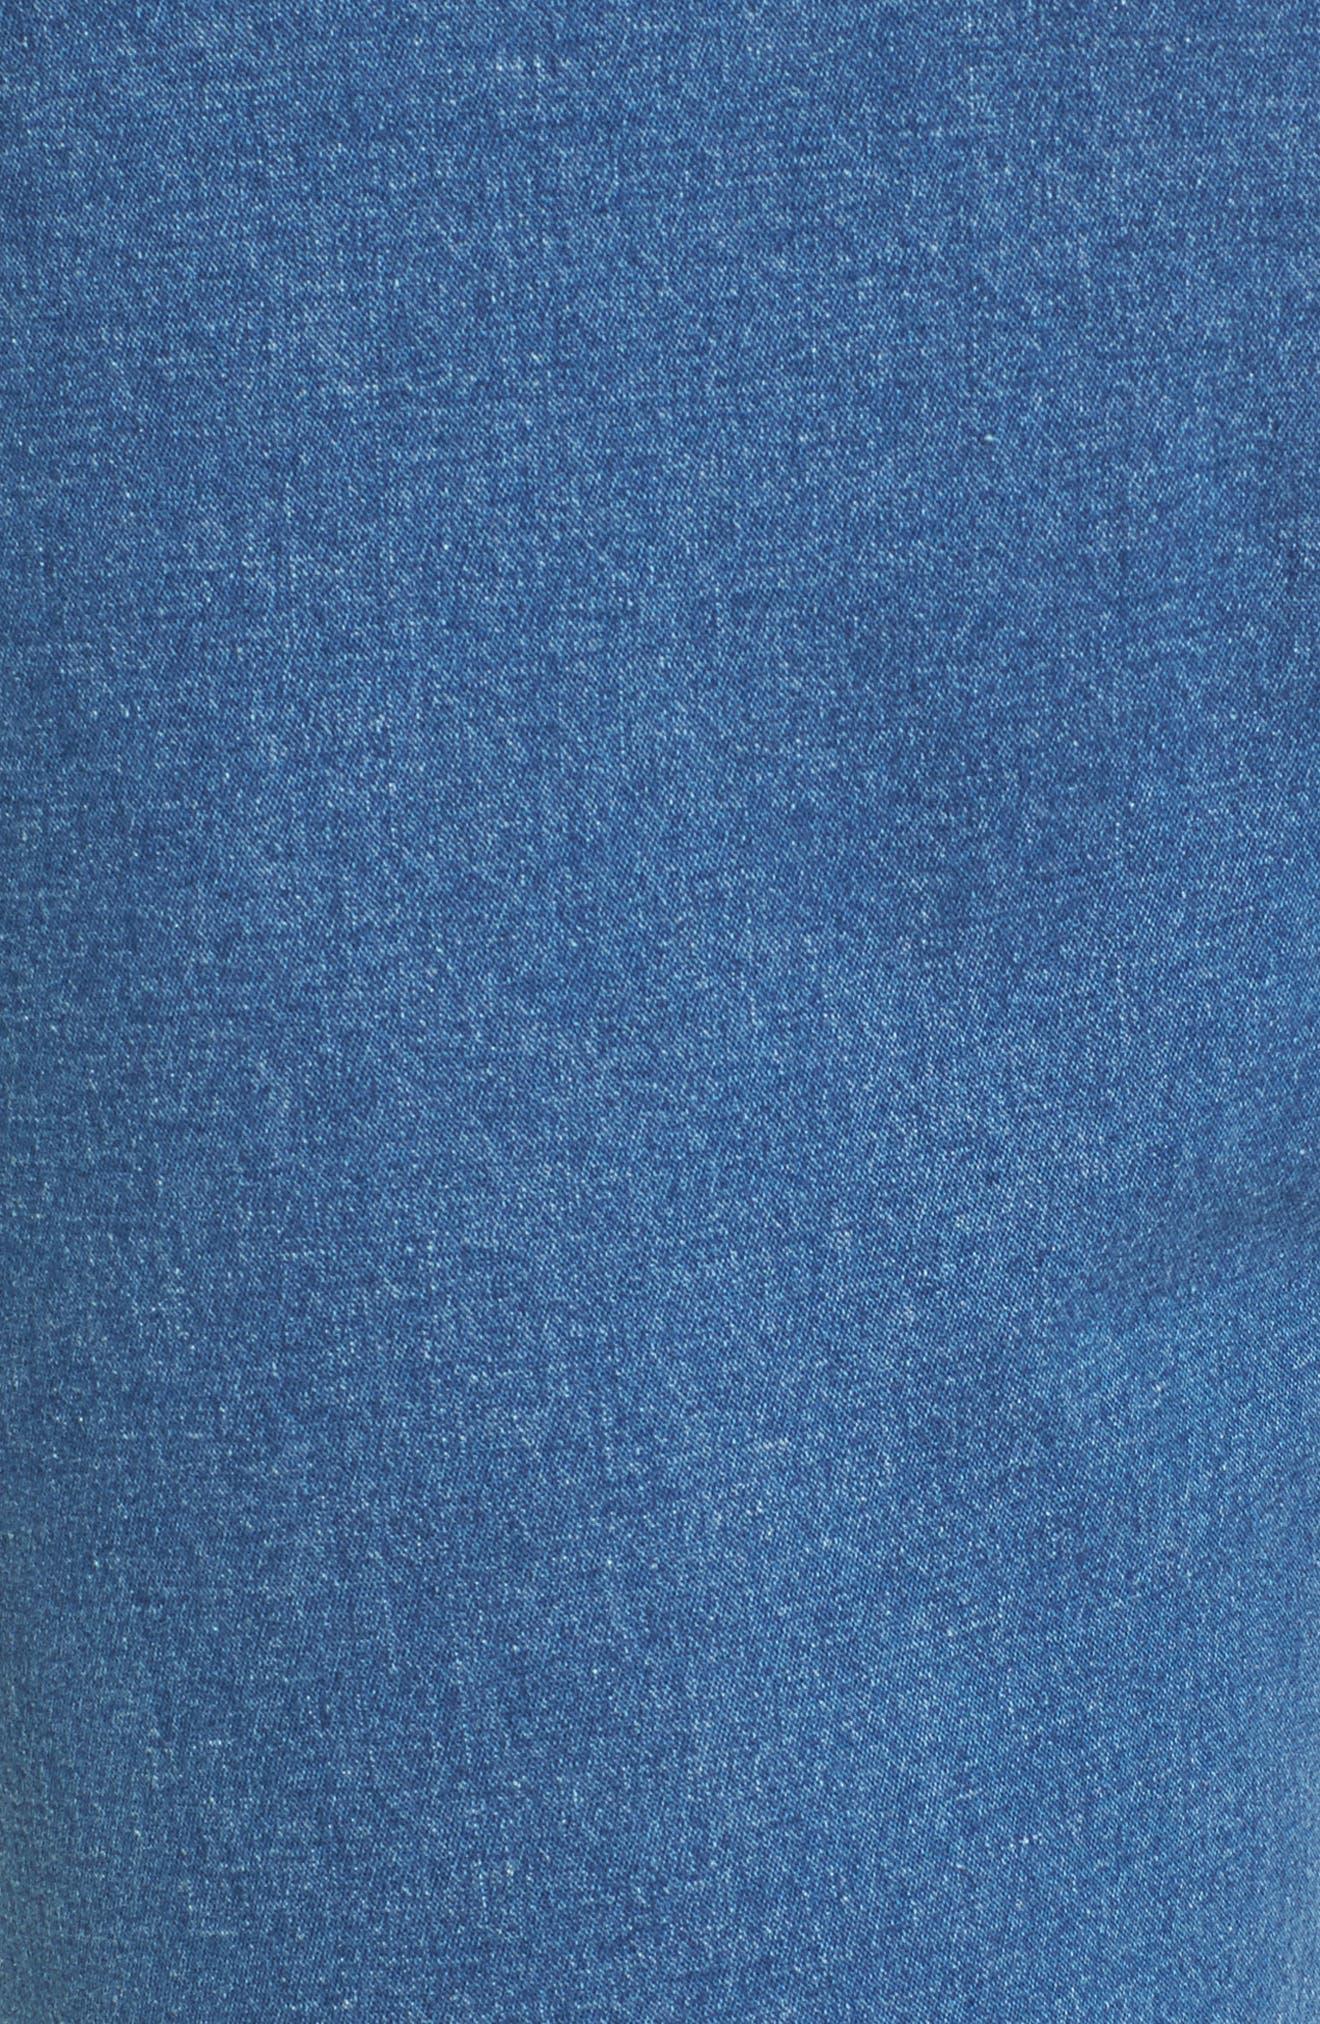 Ruffle Hem Denim Skimmer Leggings,                             Alternate thumbnail 5, color,                             Medium Wash